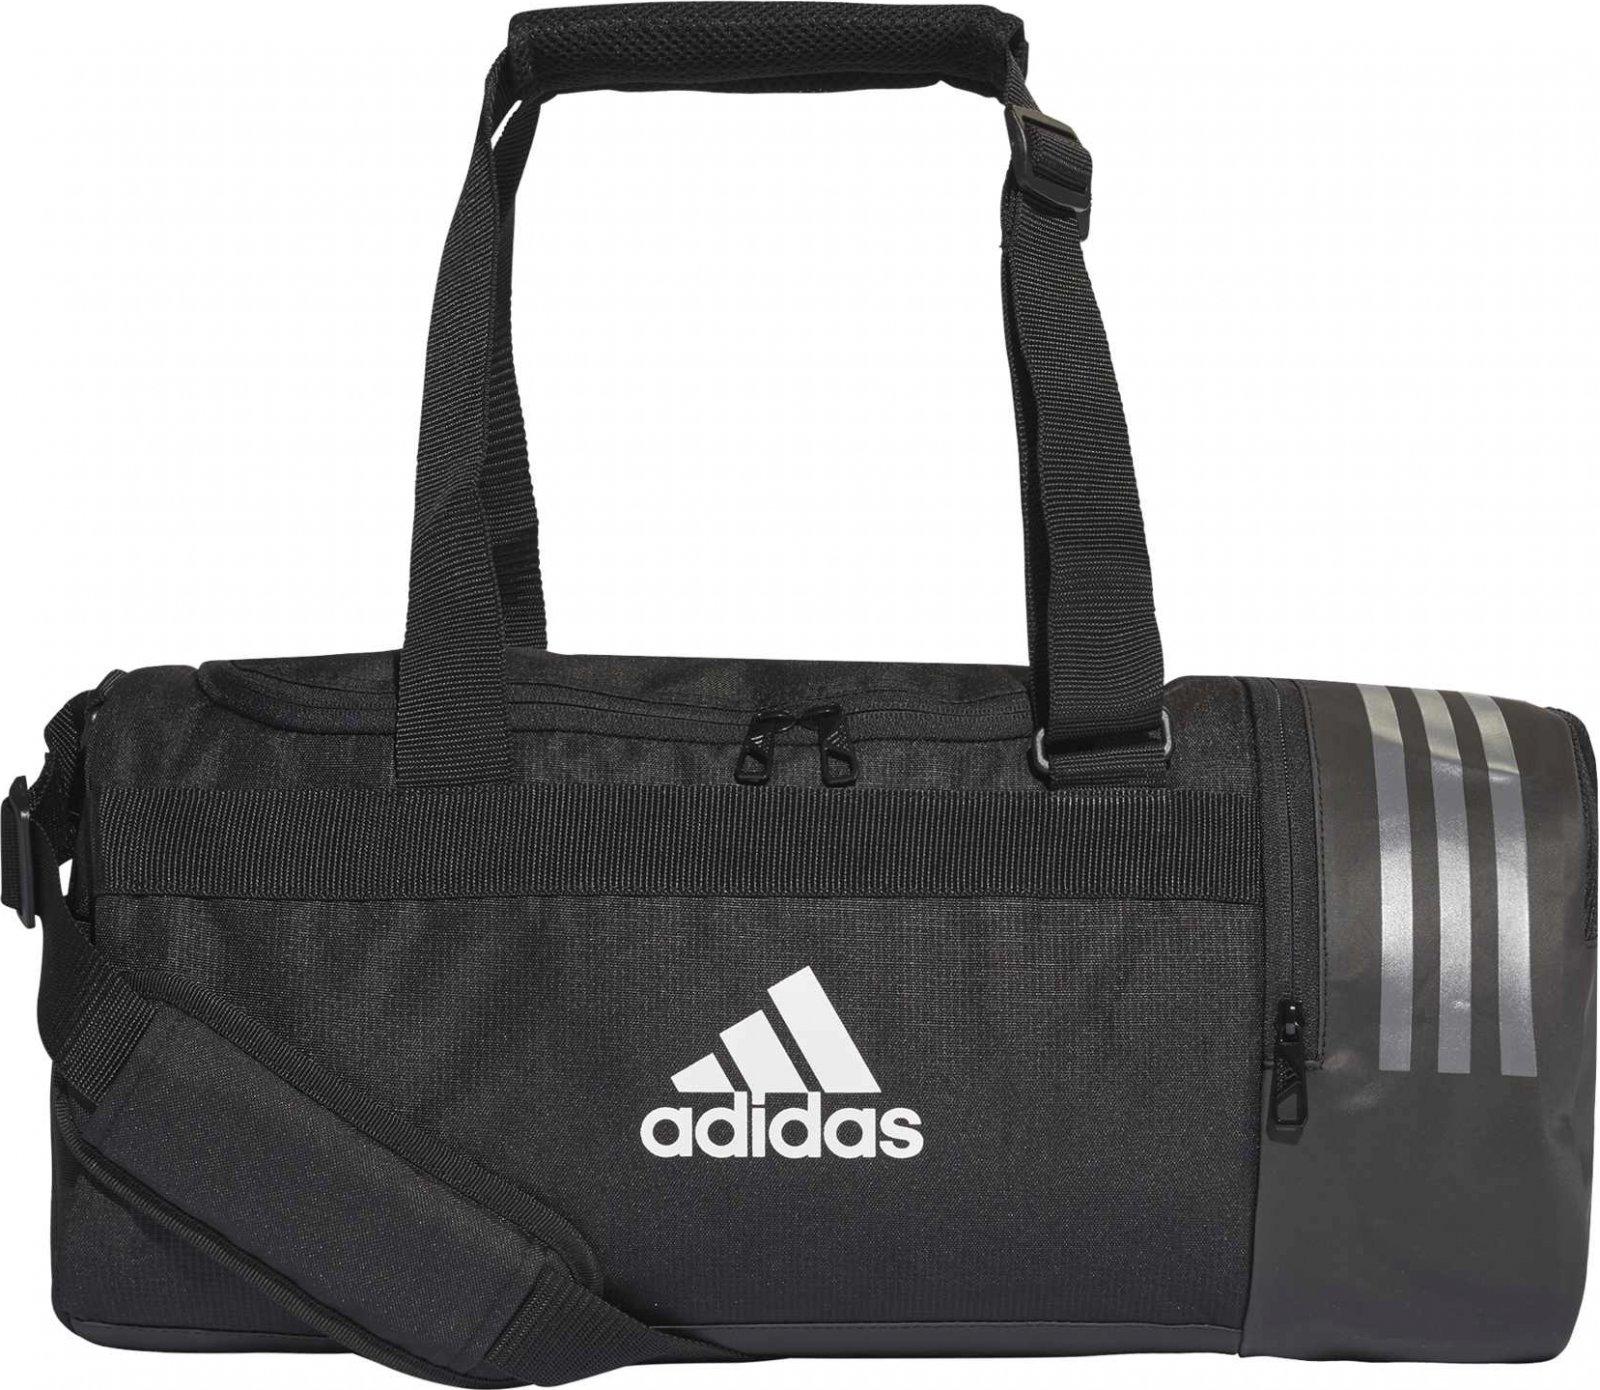 3500ec1d1 adidas 3 Stripes Duffle Small černá od 550 Kč   Zboží.cz